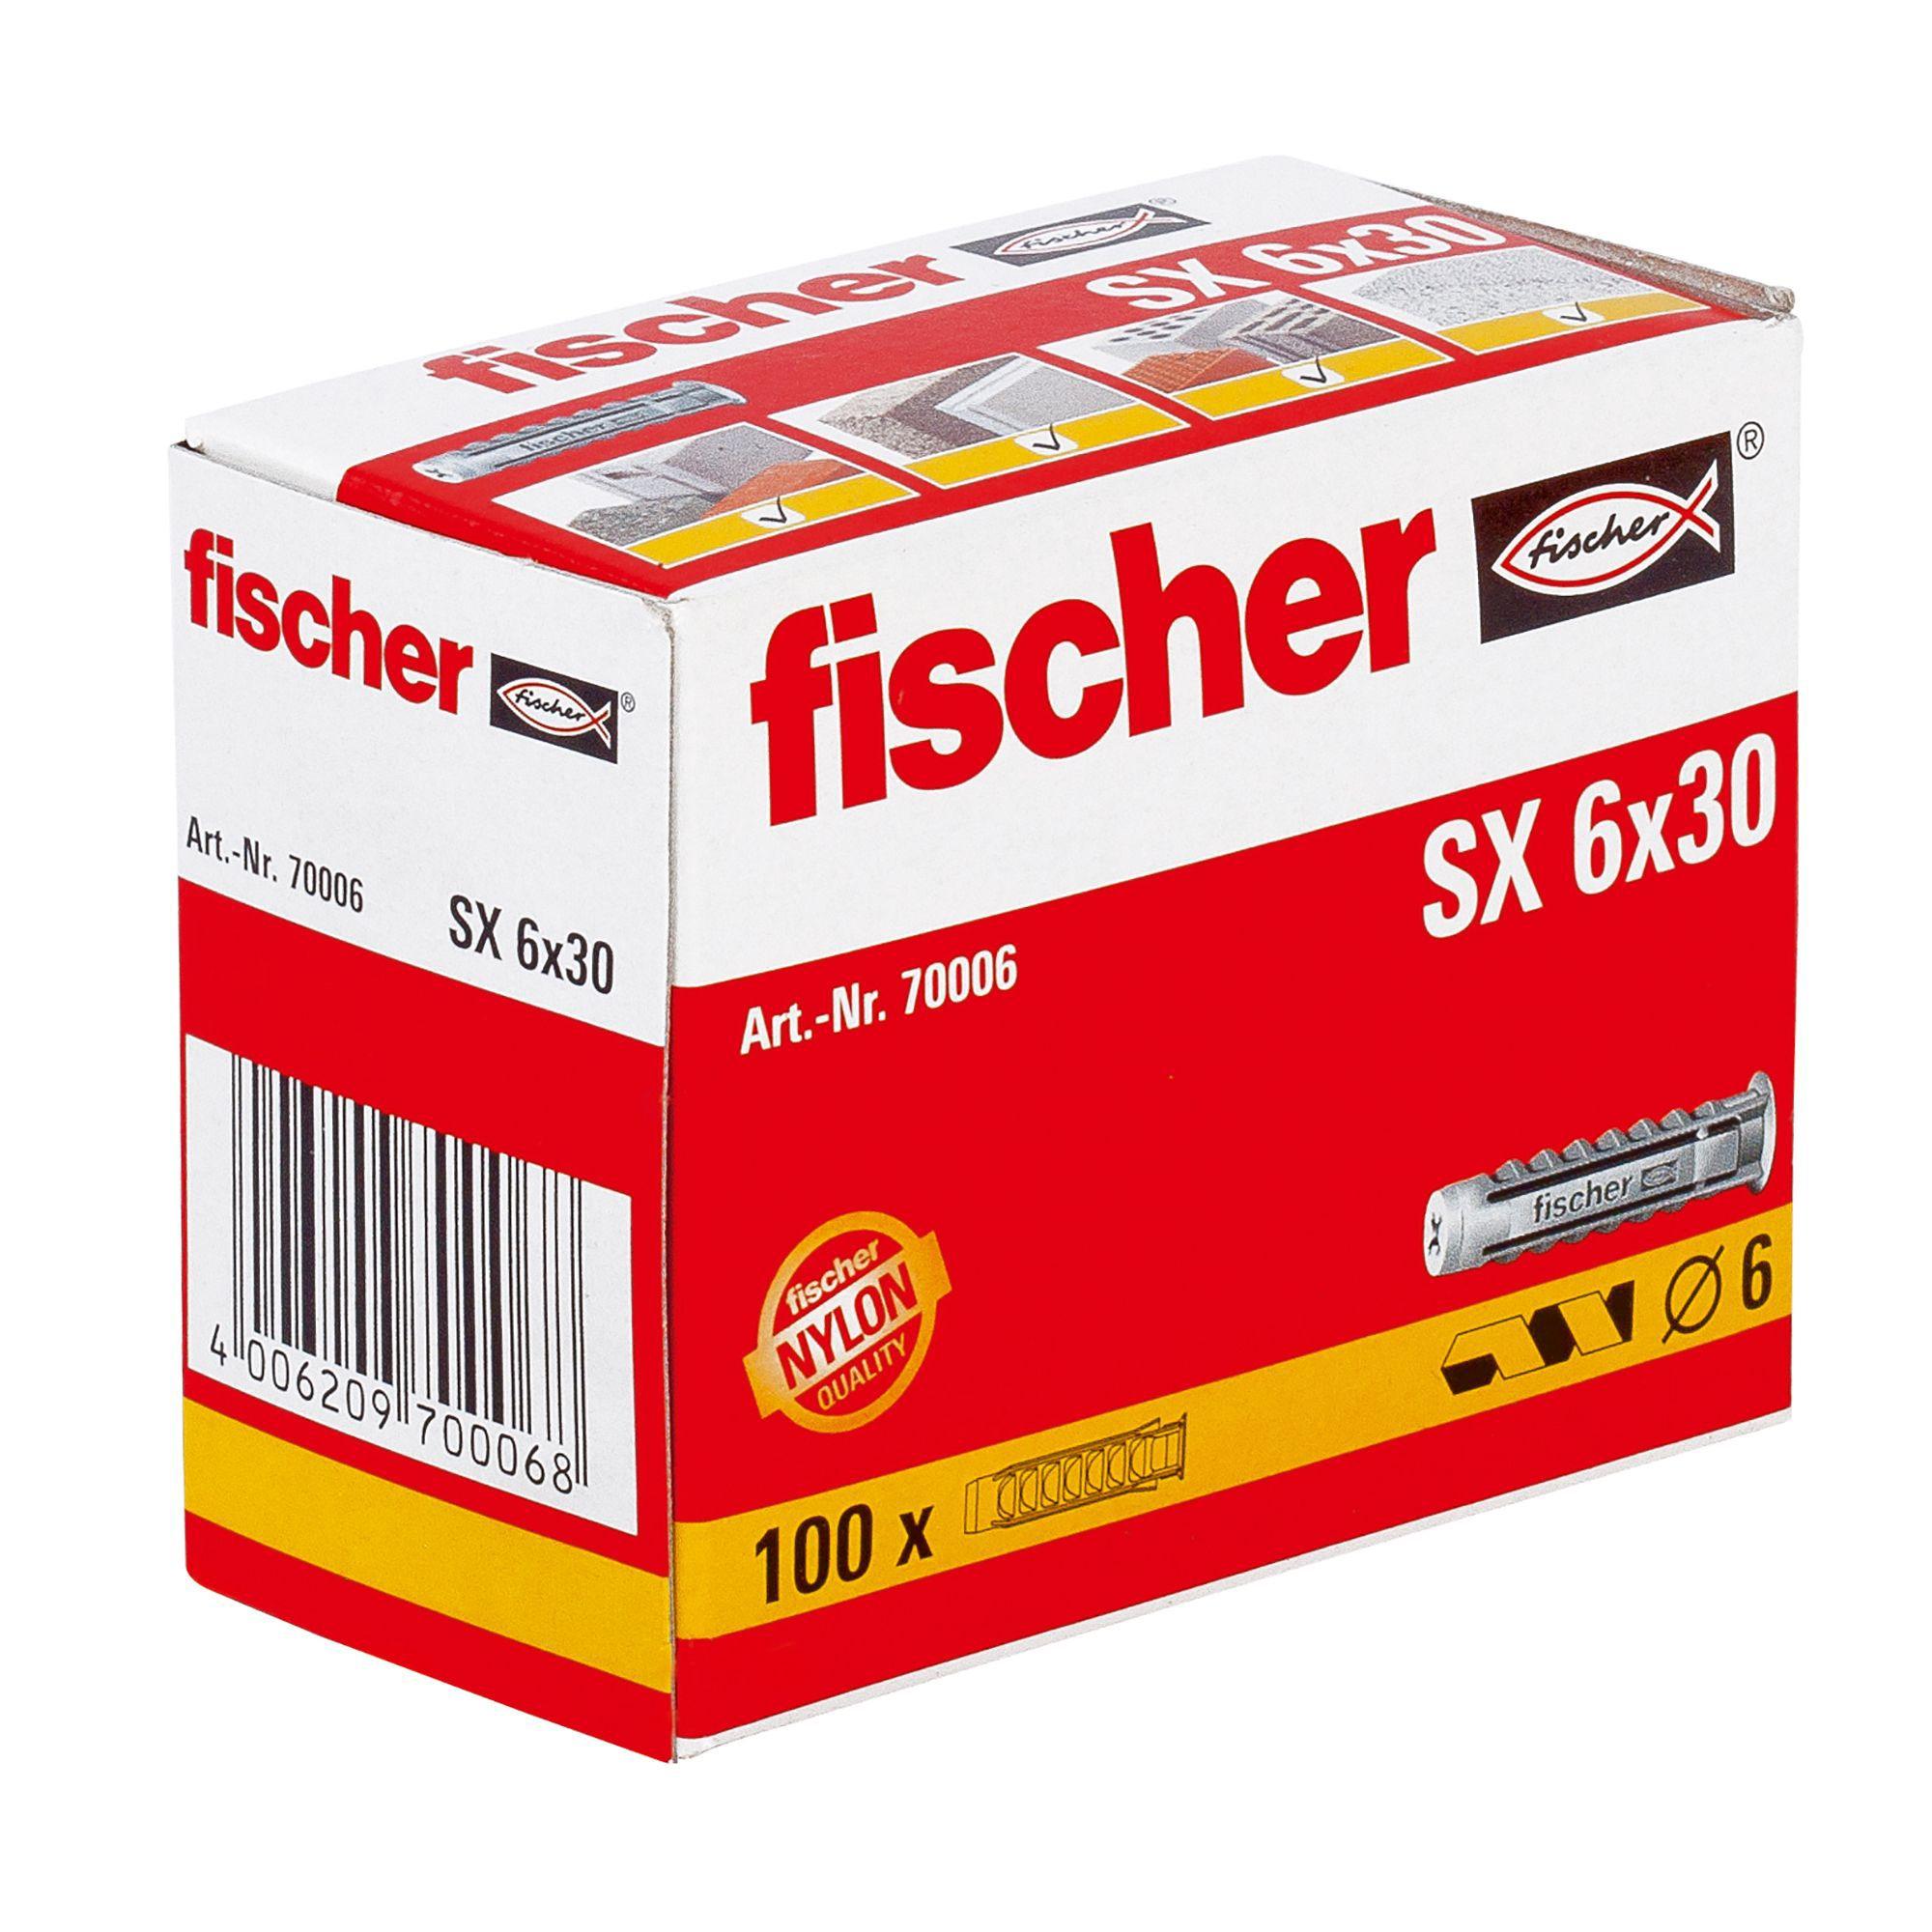 100 Fischer SX 6x30 Nylon Solid Wall Plug. Save 40% £2.35 @ B&Q (free C&C)